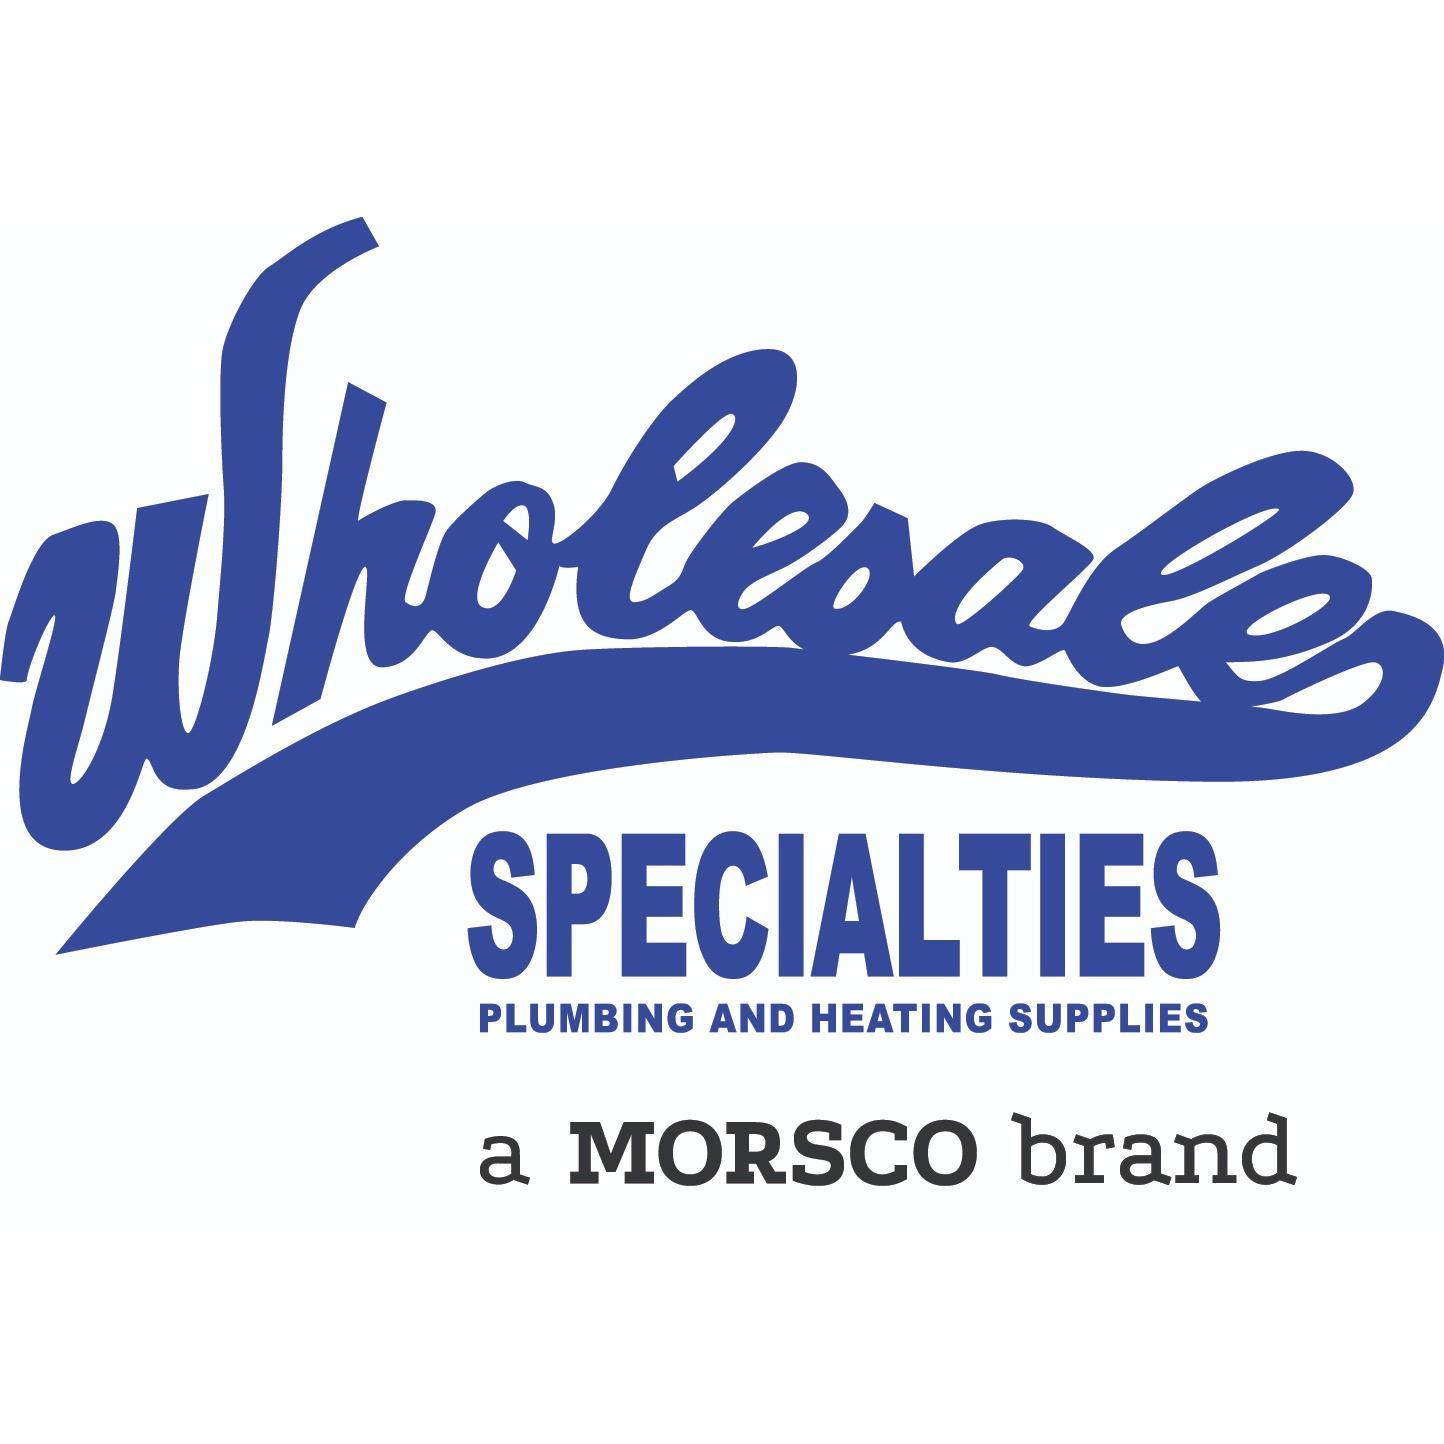 Wholesale Specialties